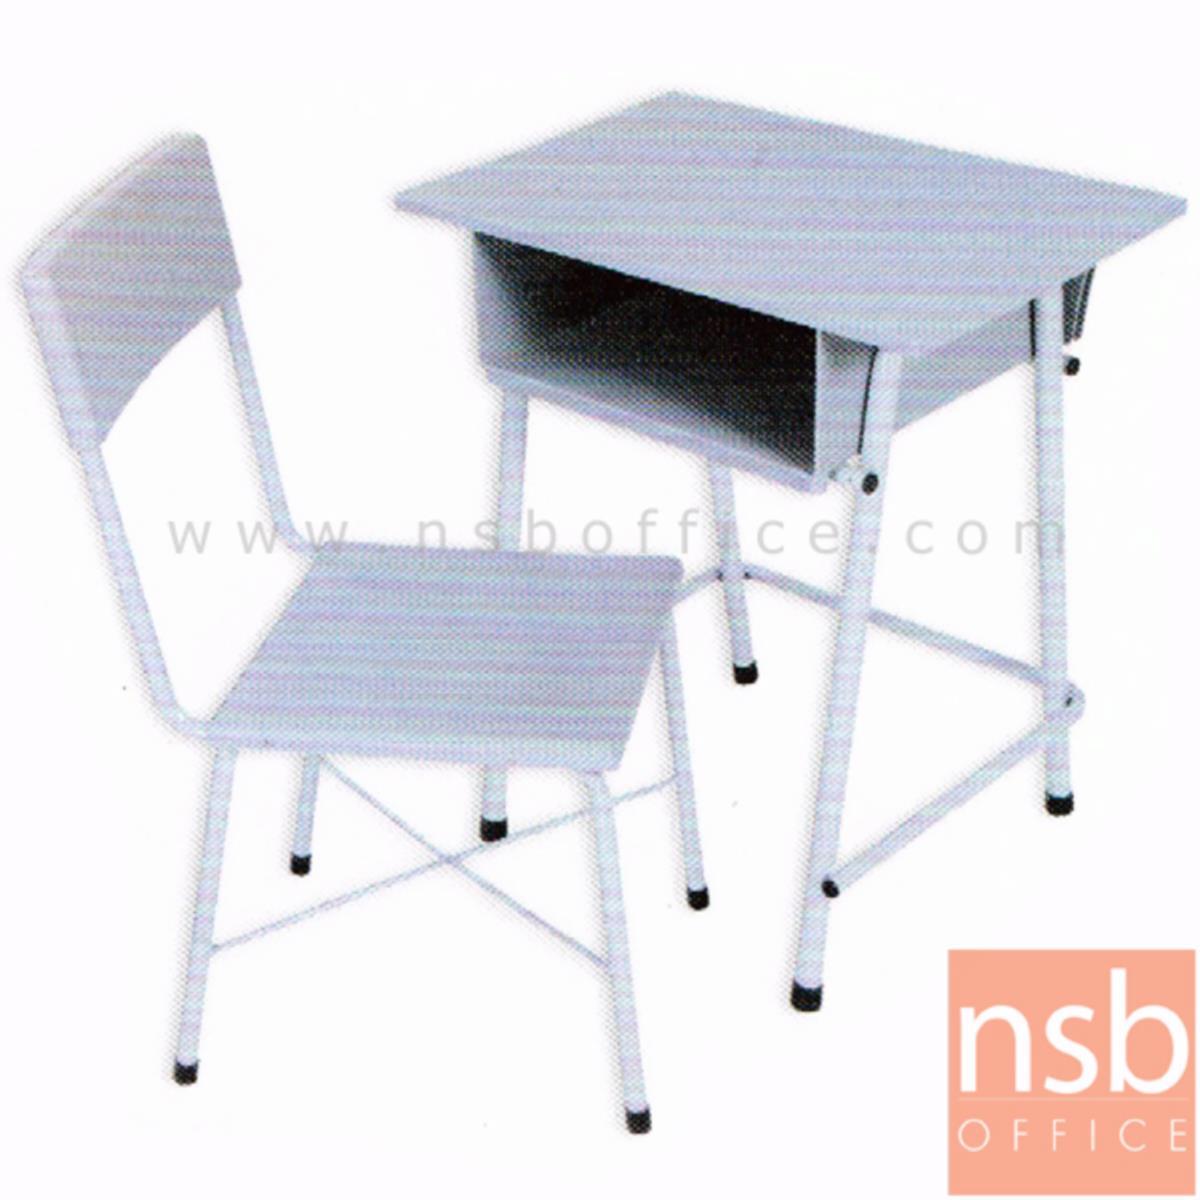 A17A029:ชุดโต๊ะและเก้าอี้นักเรียน รุ่น Amberlia (แอมเบอเลีย)  ขาเหล็กกลมพ่นสี